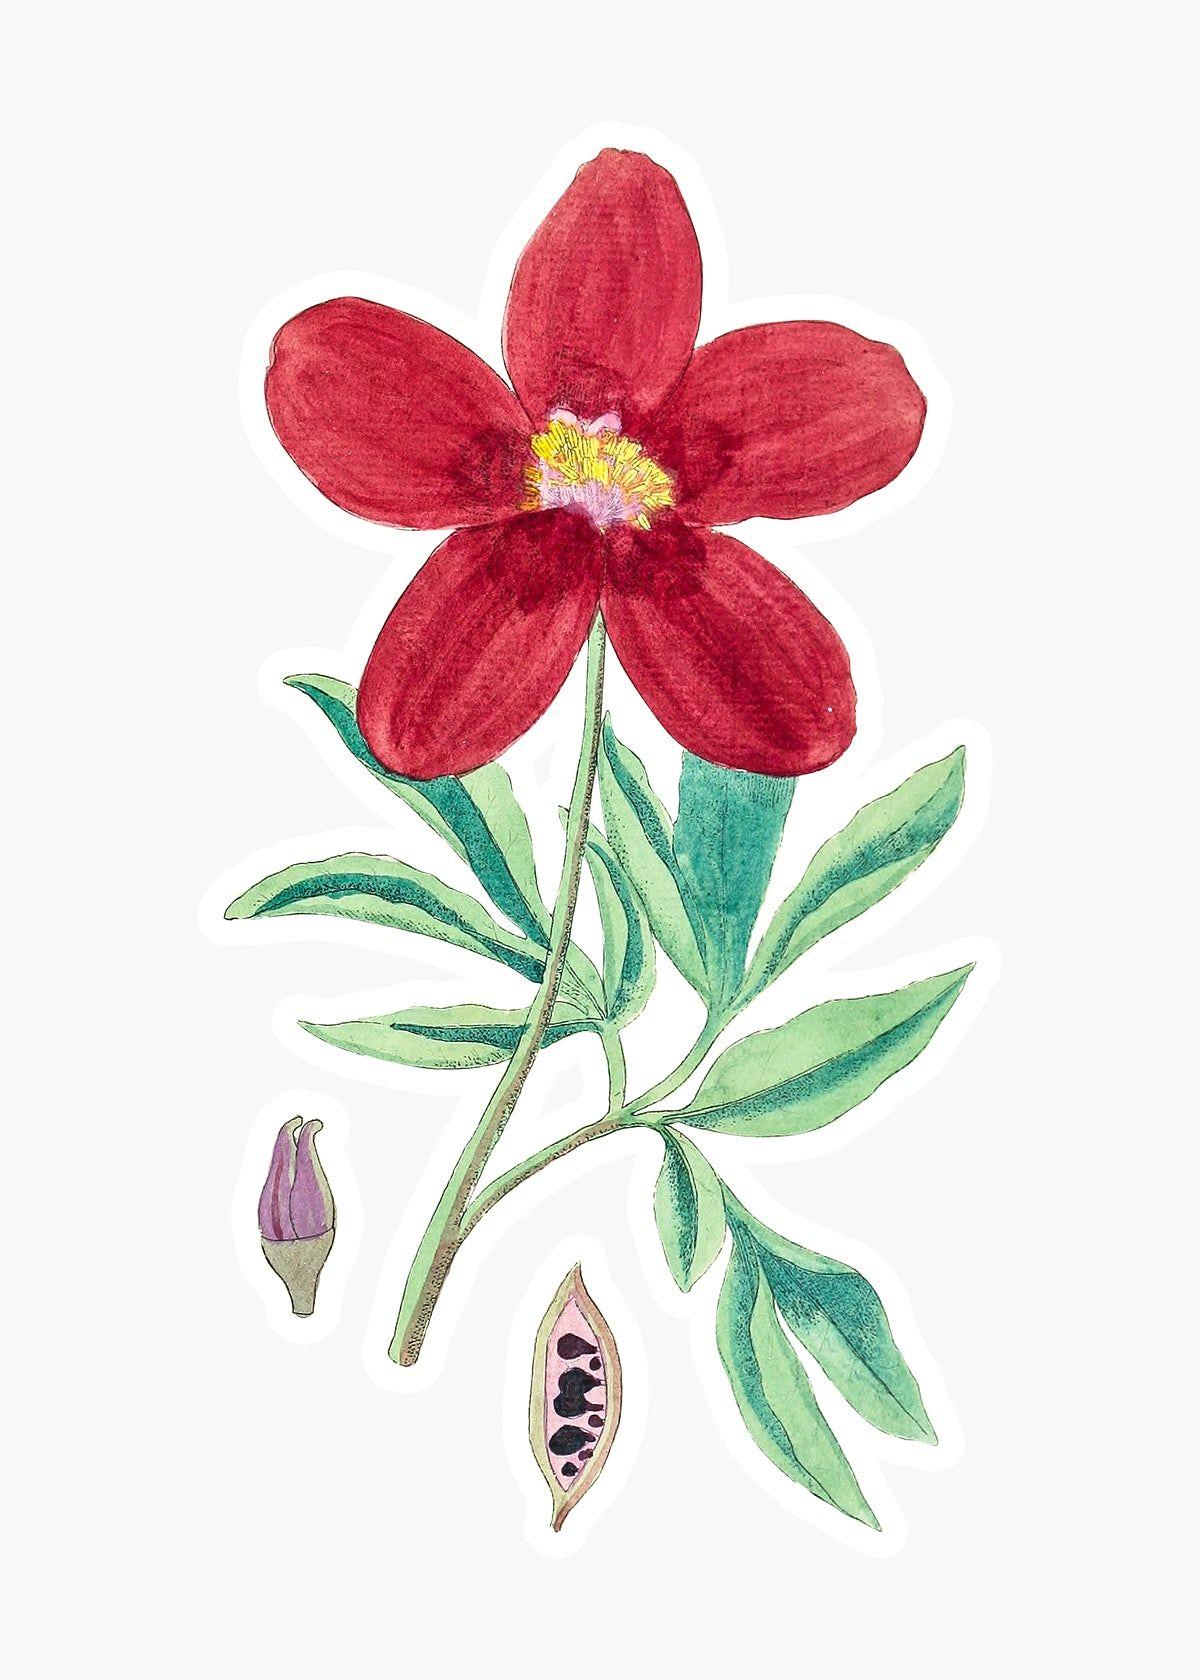 Pin on Botanical flowers